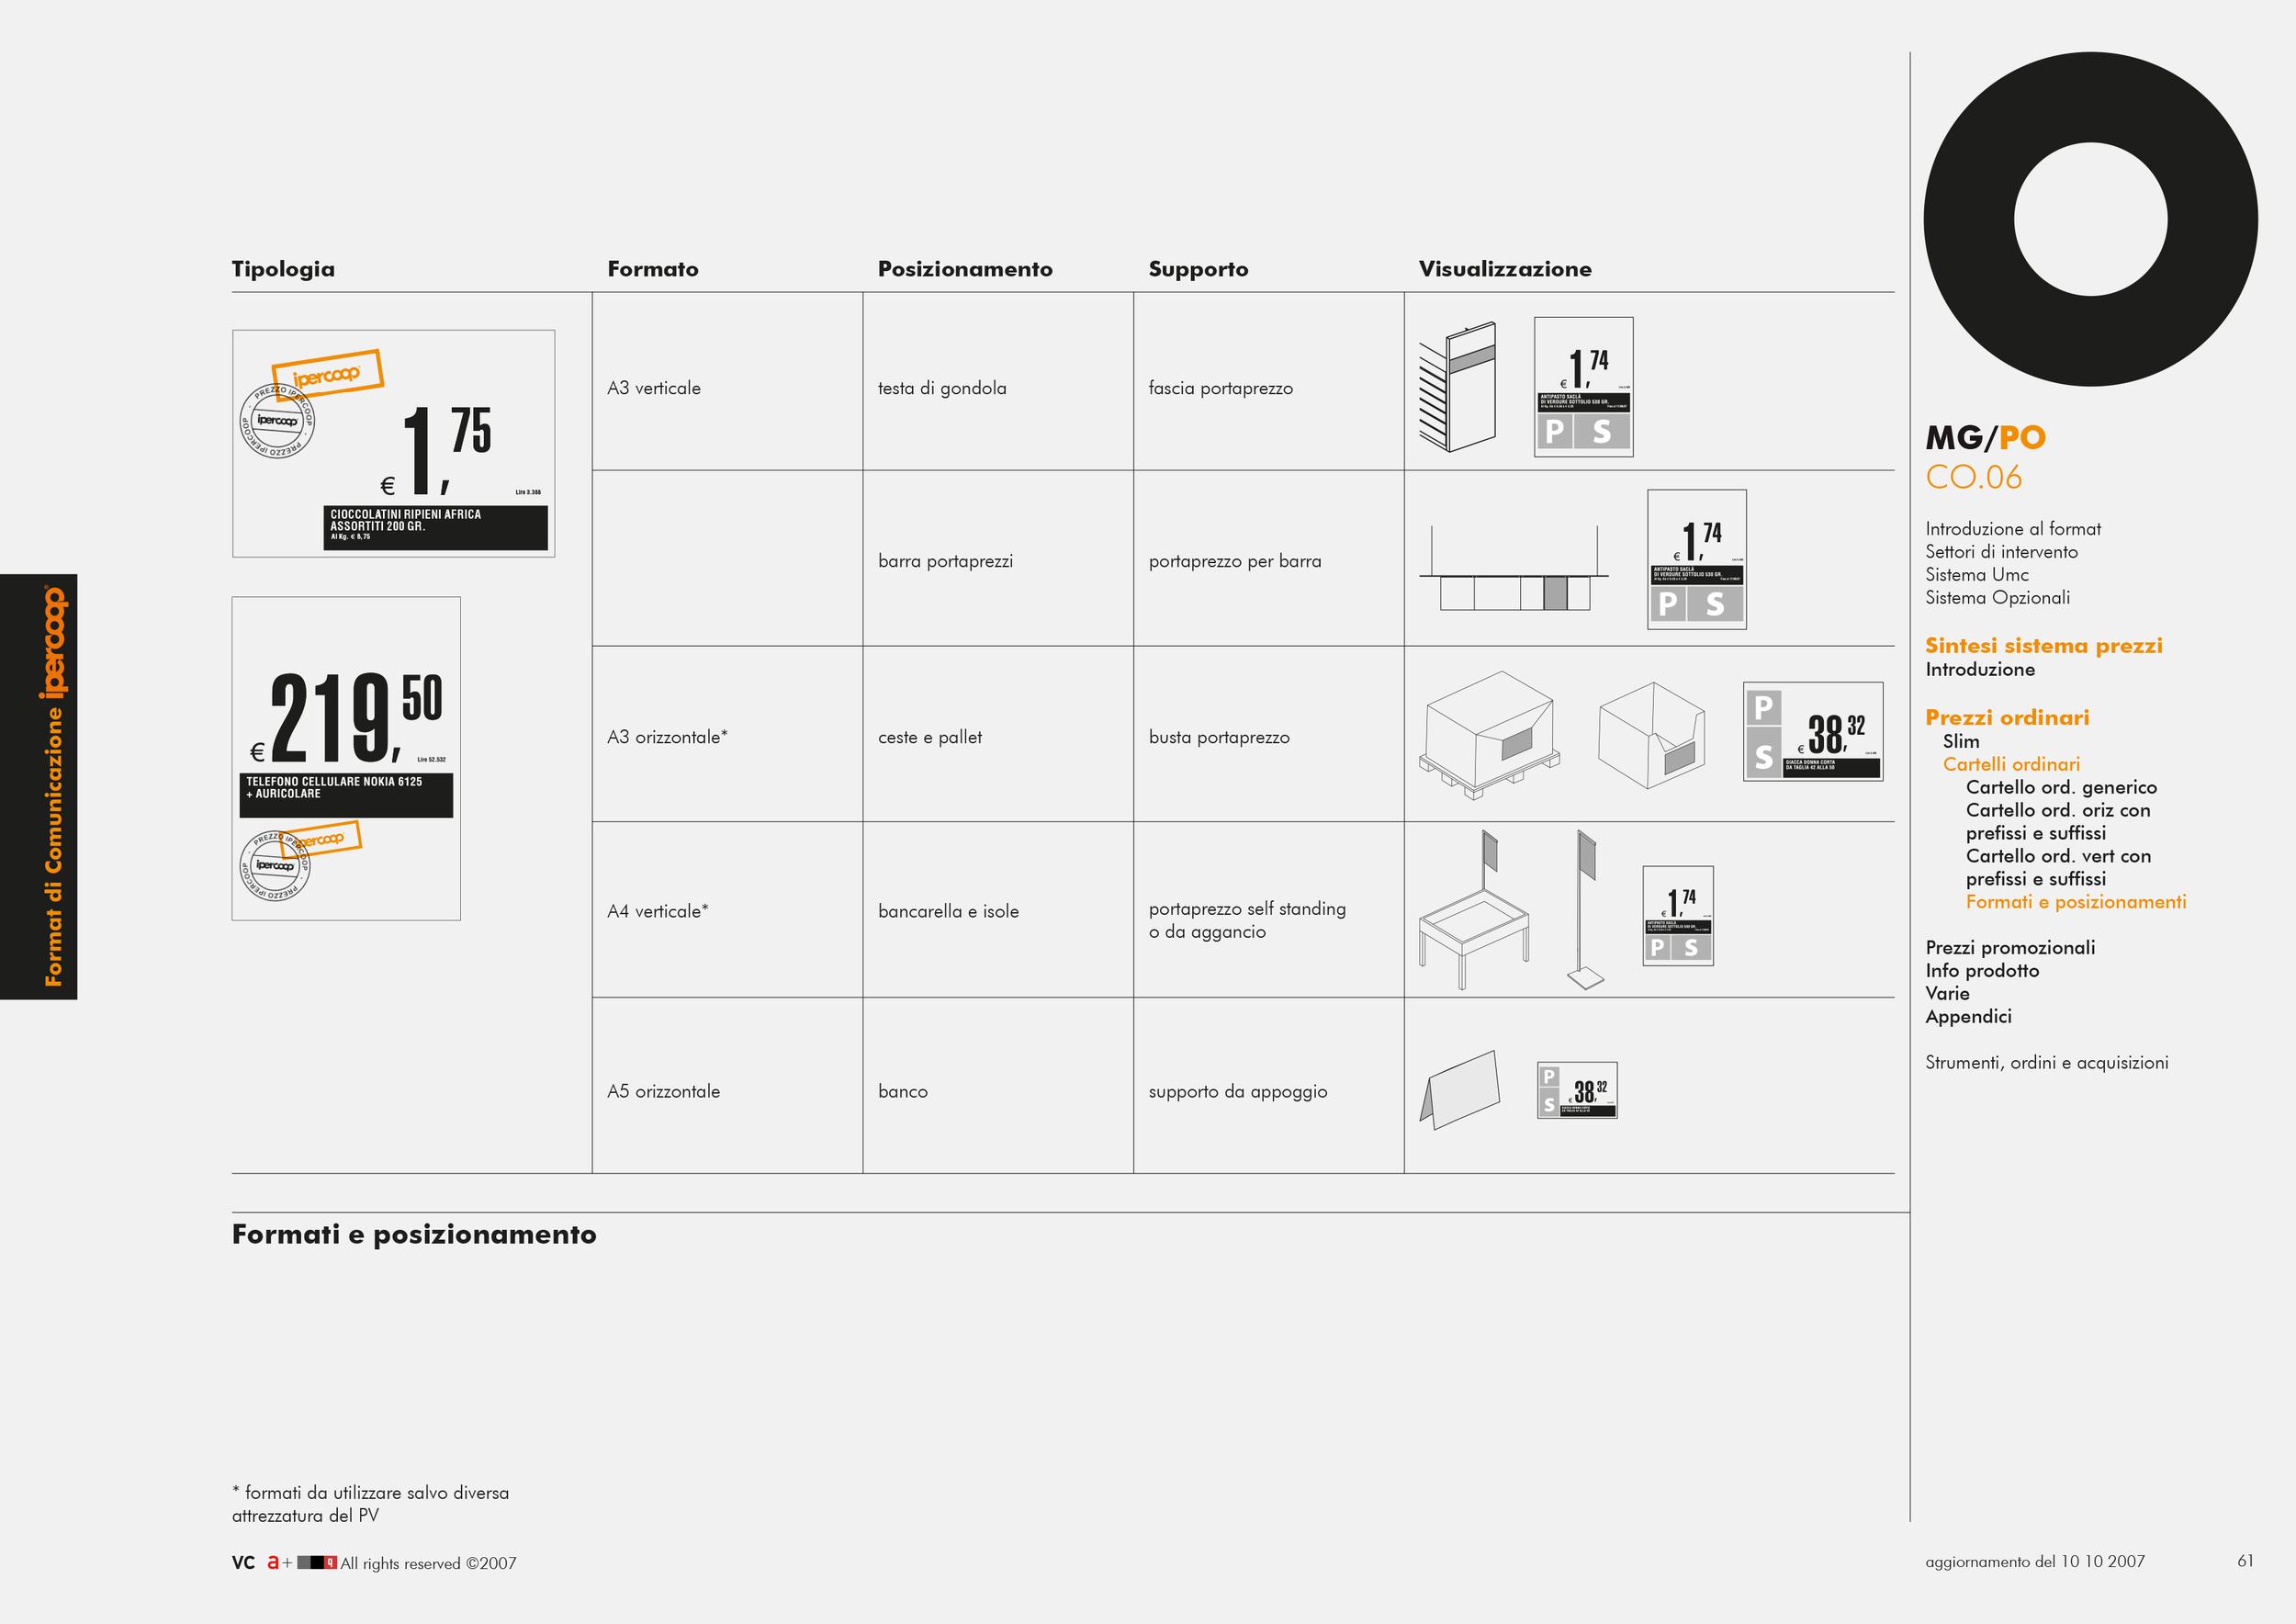 manuale-CONCEPT-11.jpg